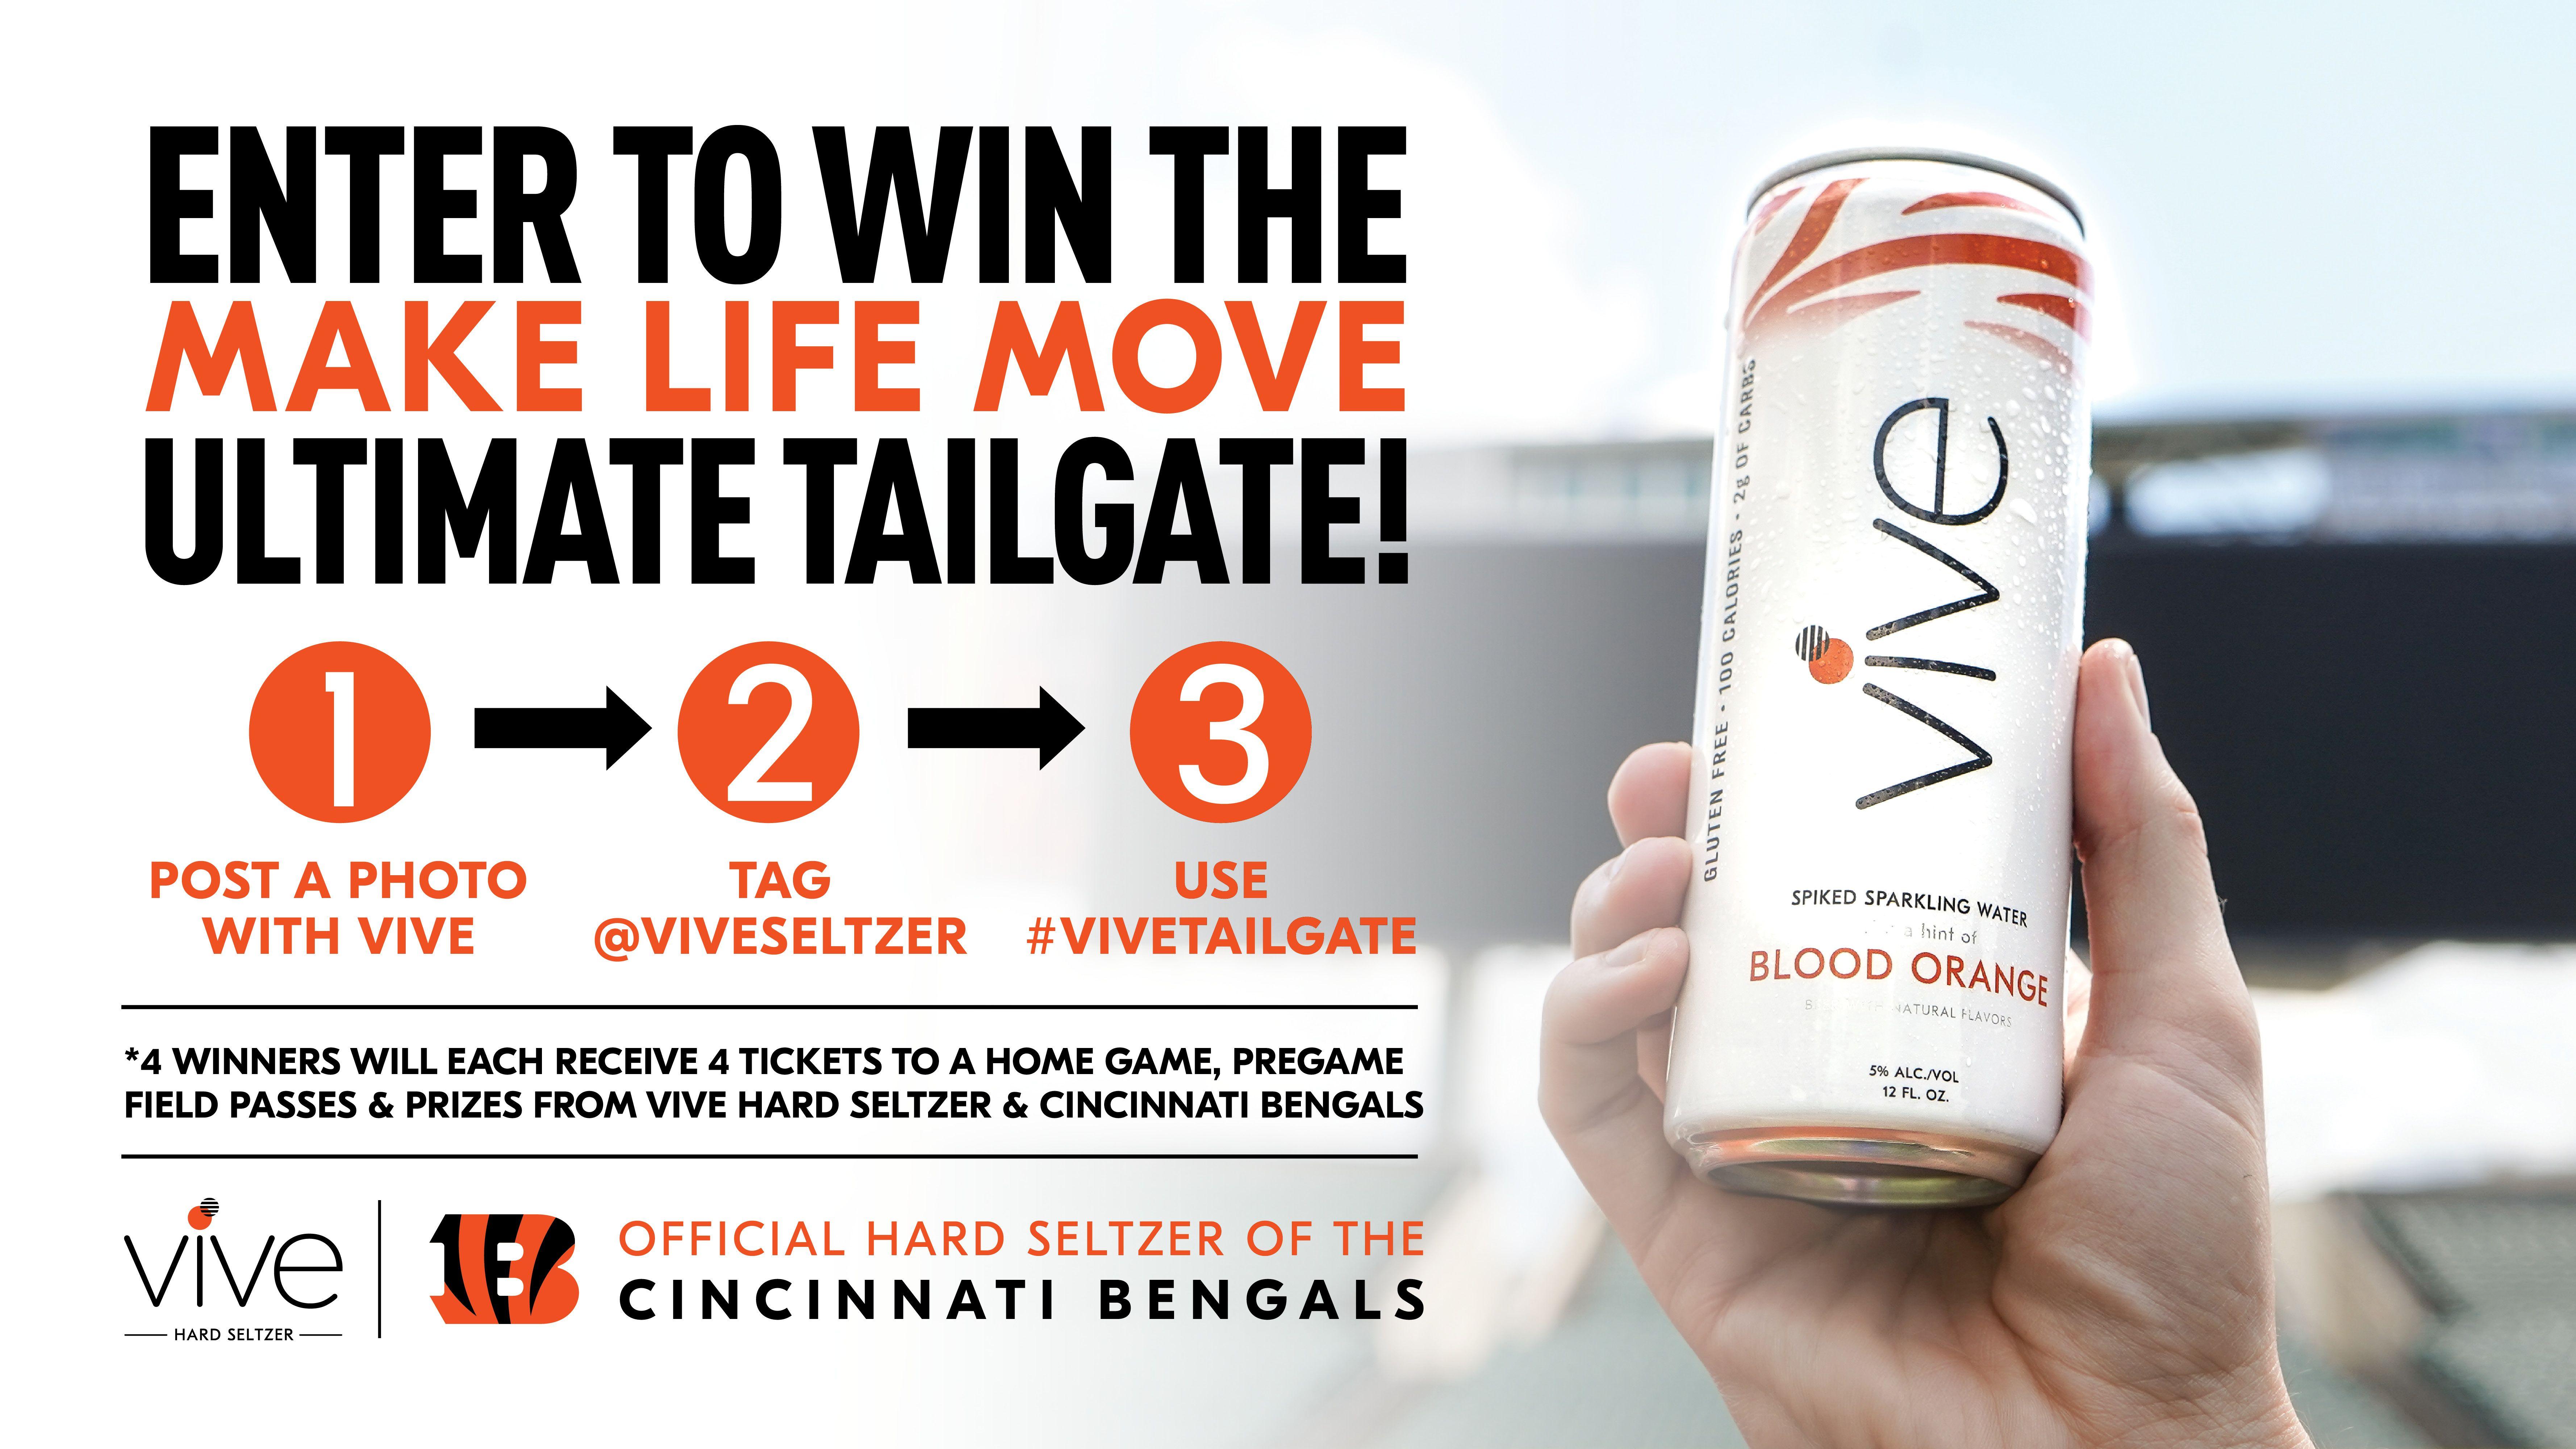 VIVE's Make Life Move Tailgate Sweepstakes